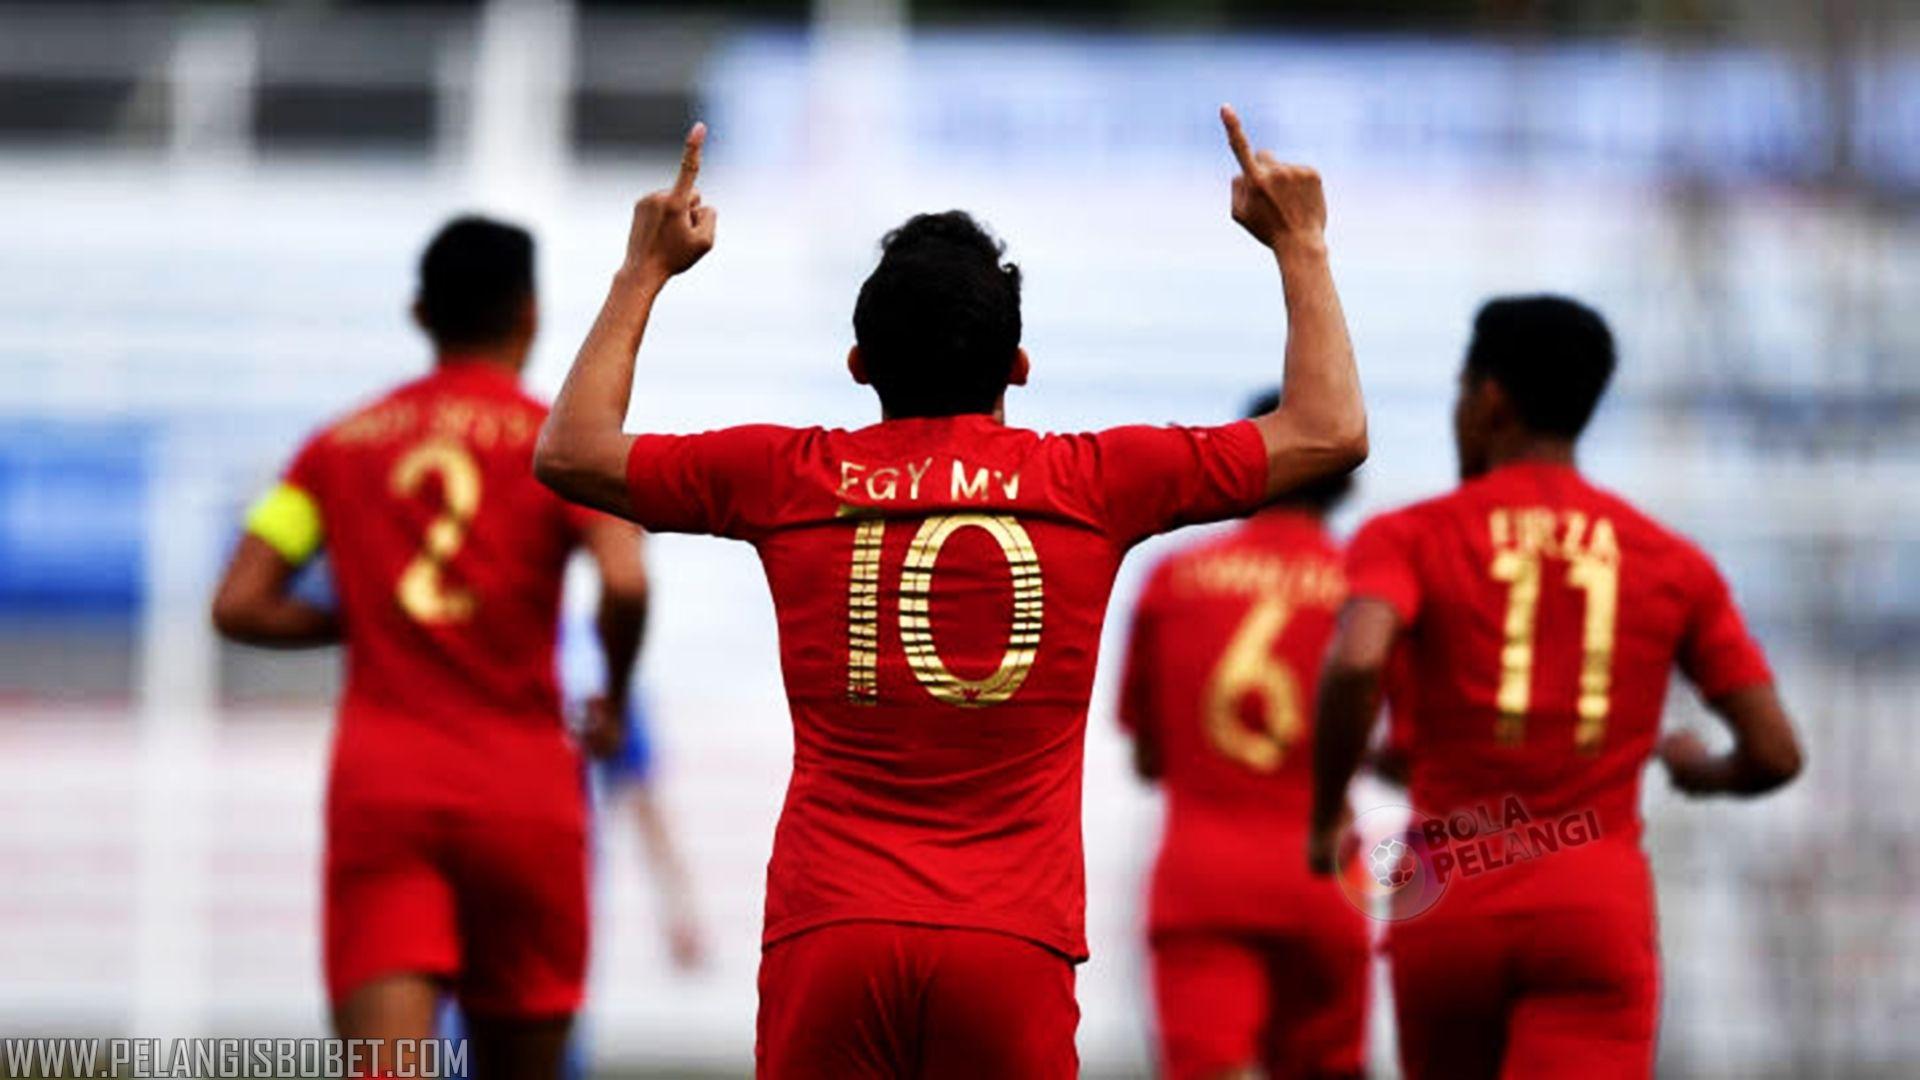 Indonesia Pasti Mampu Membuat 6 Gol Sports Jersey Jersey Ronald Mcdonald